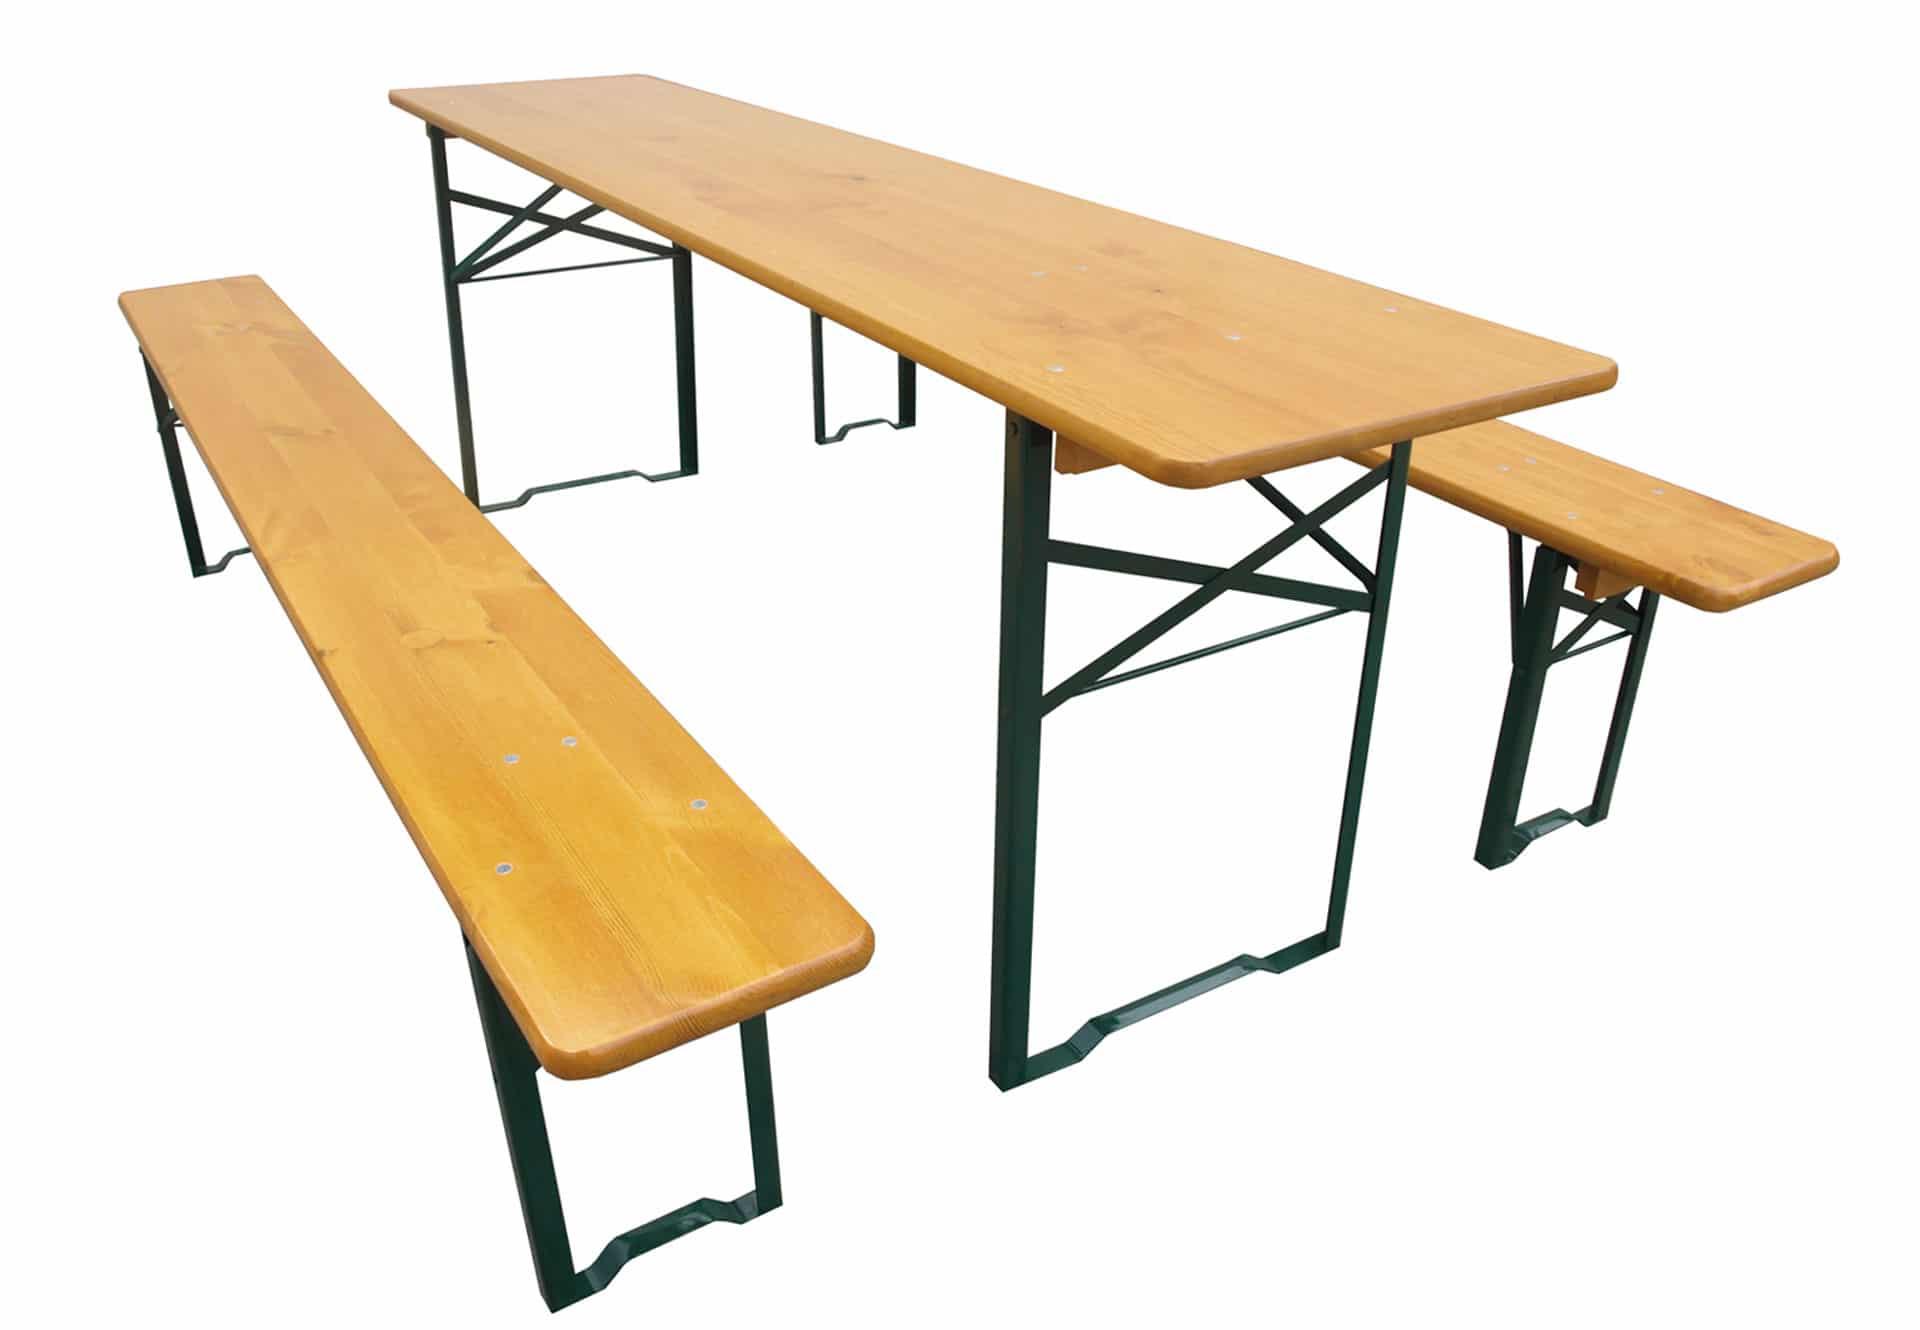 Tavoli Panche Pieghevoli Prezzi.Tavoli Panche E Sedie Pieghevoli I Modelli Qualyline